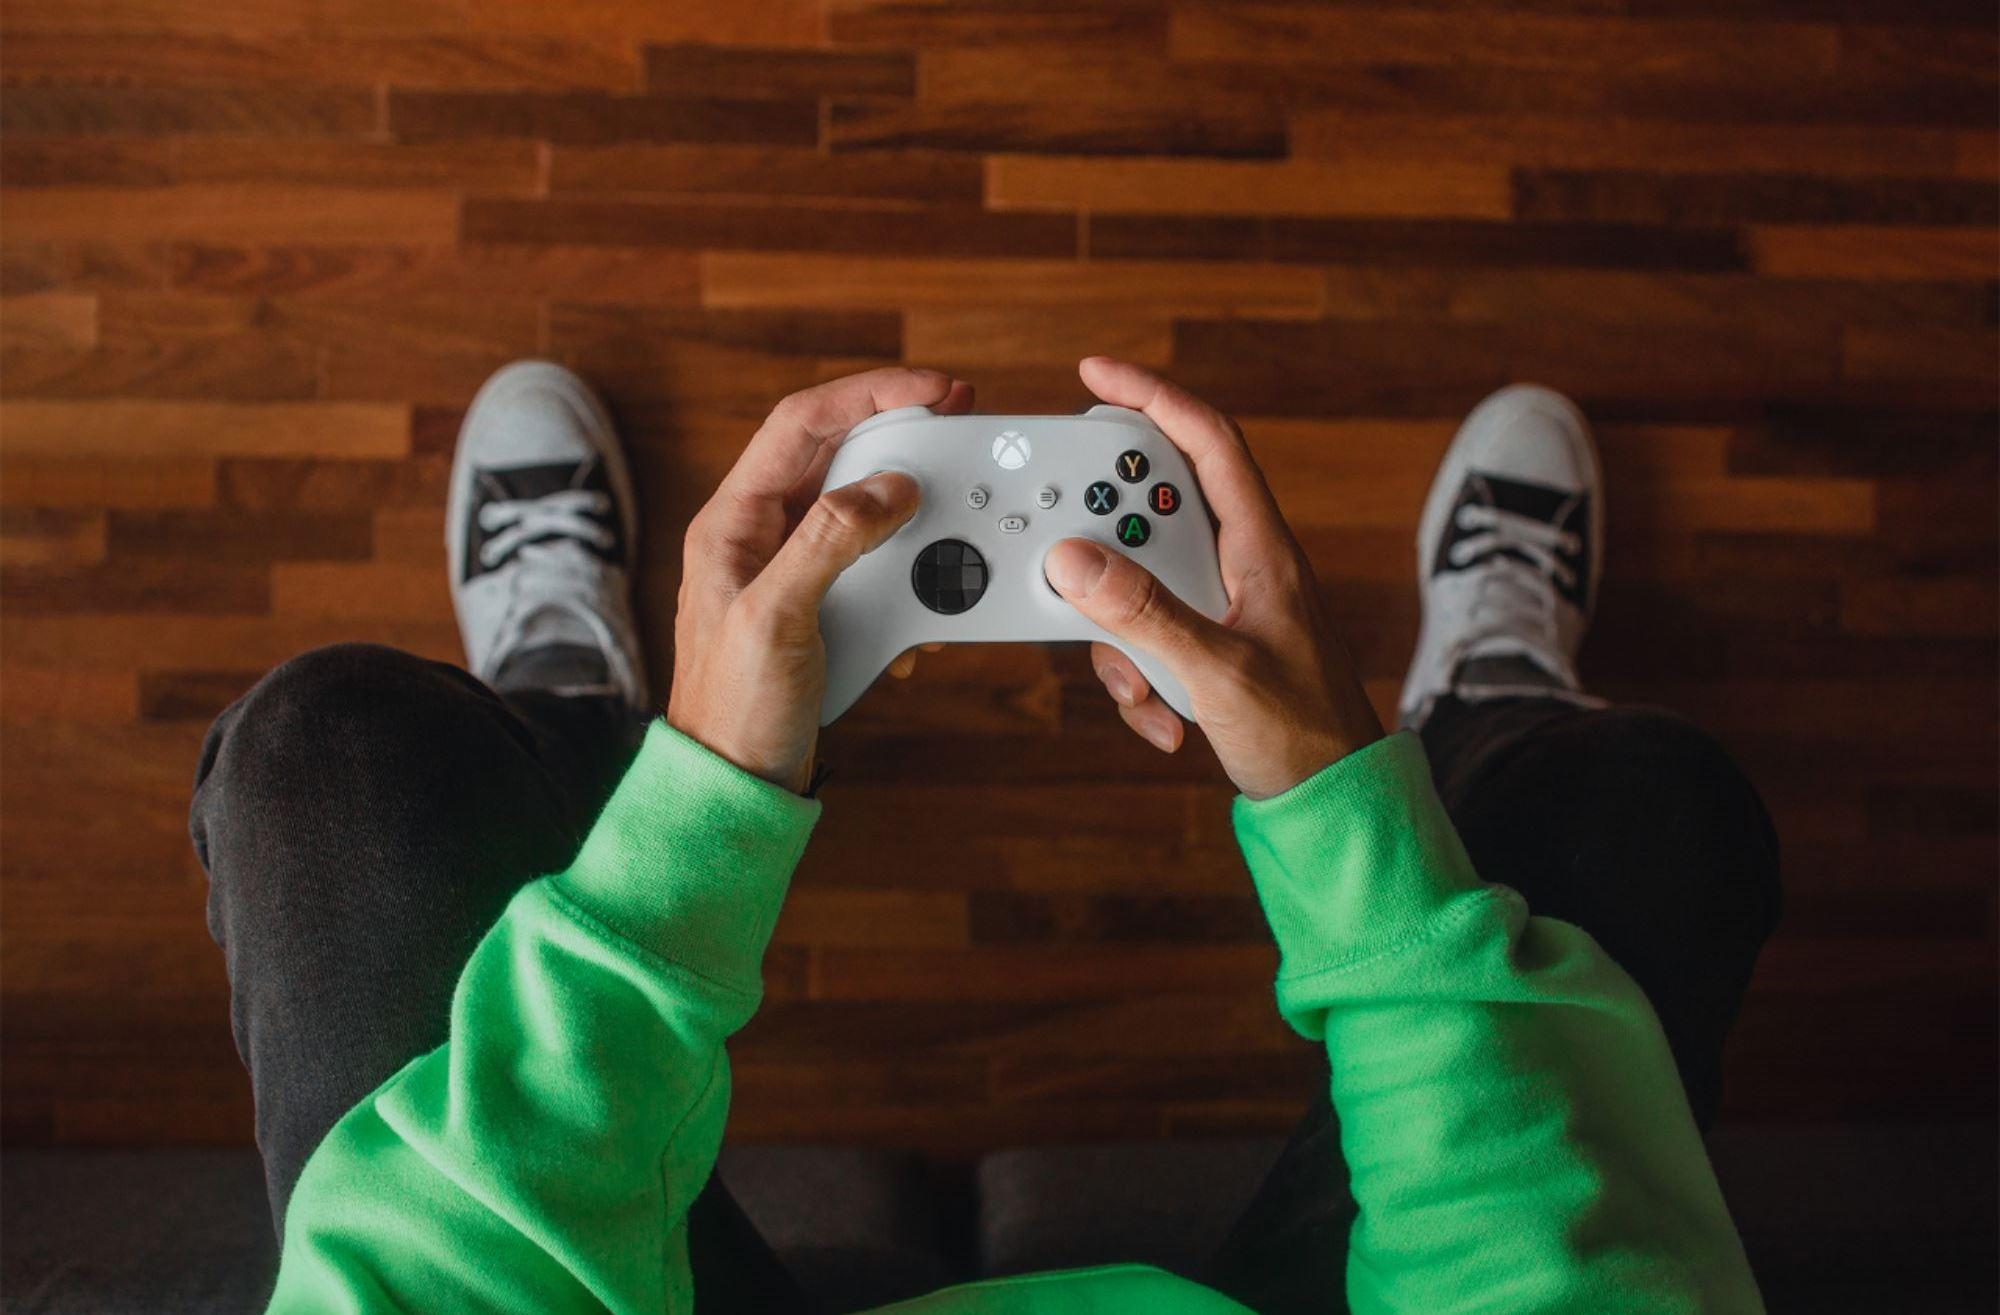 Gamepad Xbox Wireless Controller 4 skvěle padne do ruky díky texturovanému povrchu!